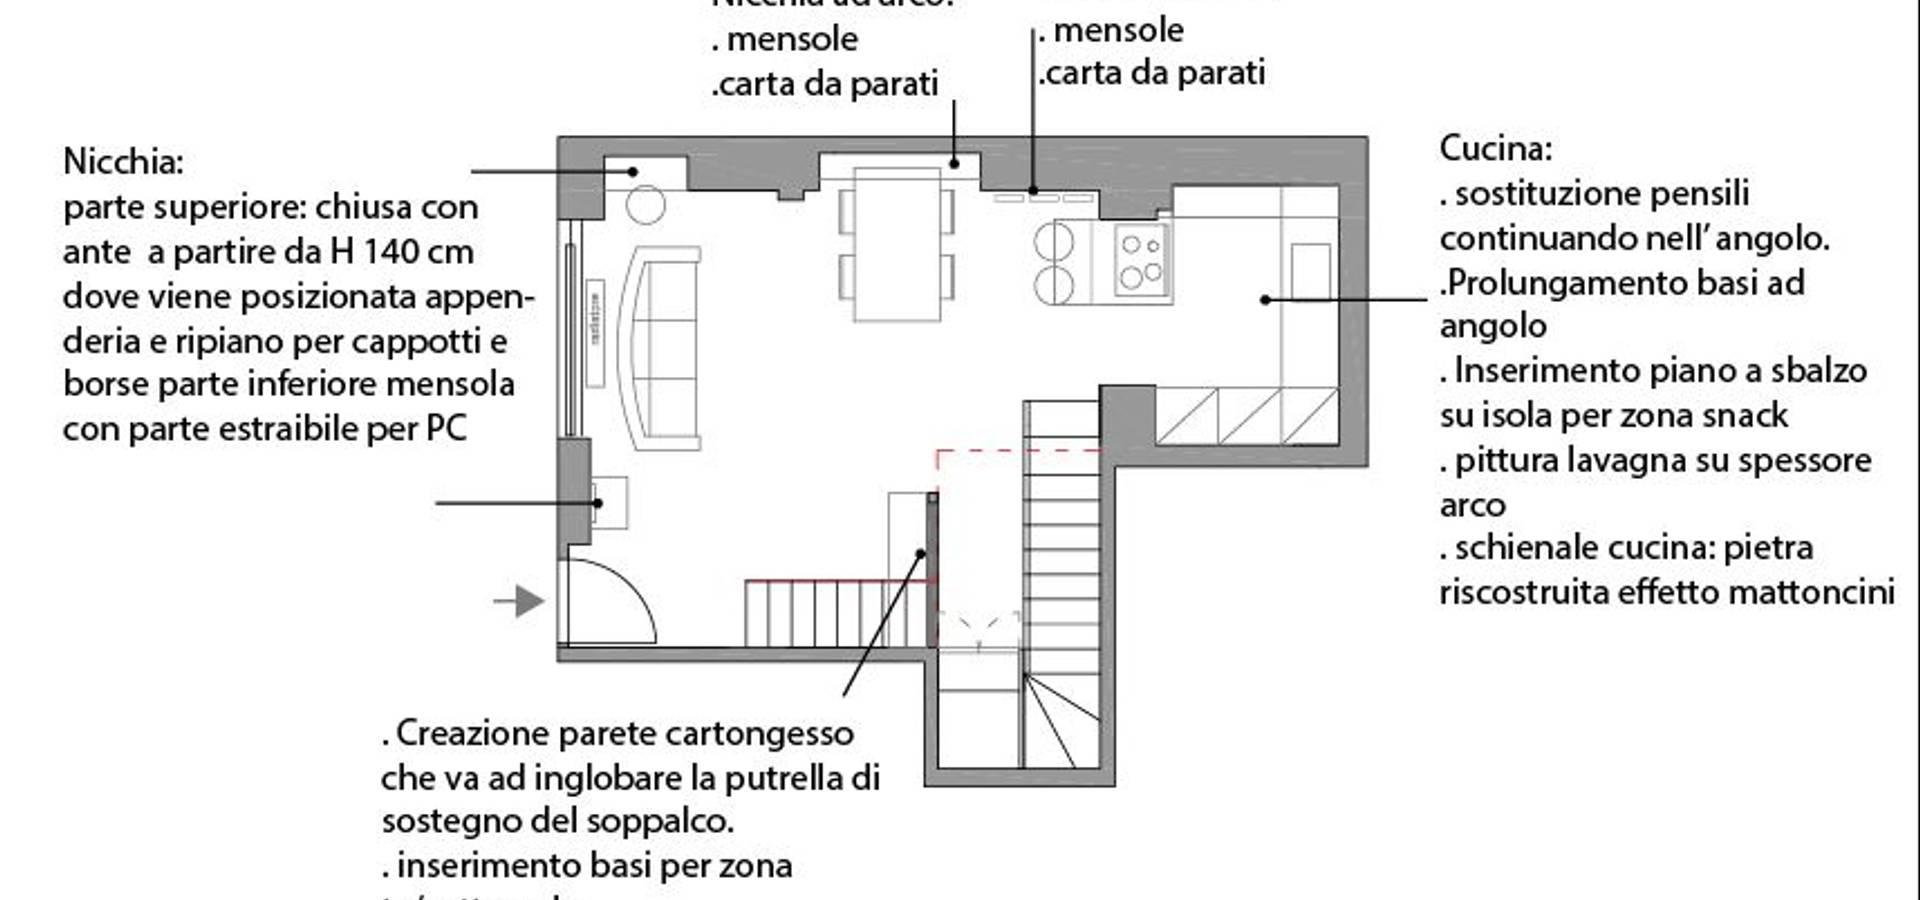 Mensole In Cartongesso Ad Angolo progetti by azzurra lorenzetto-maydaycasa | homify